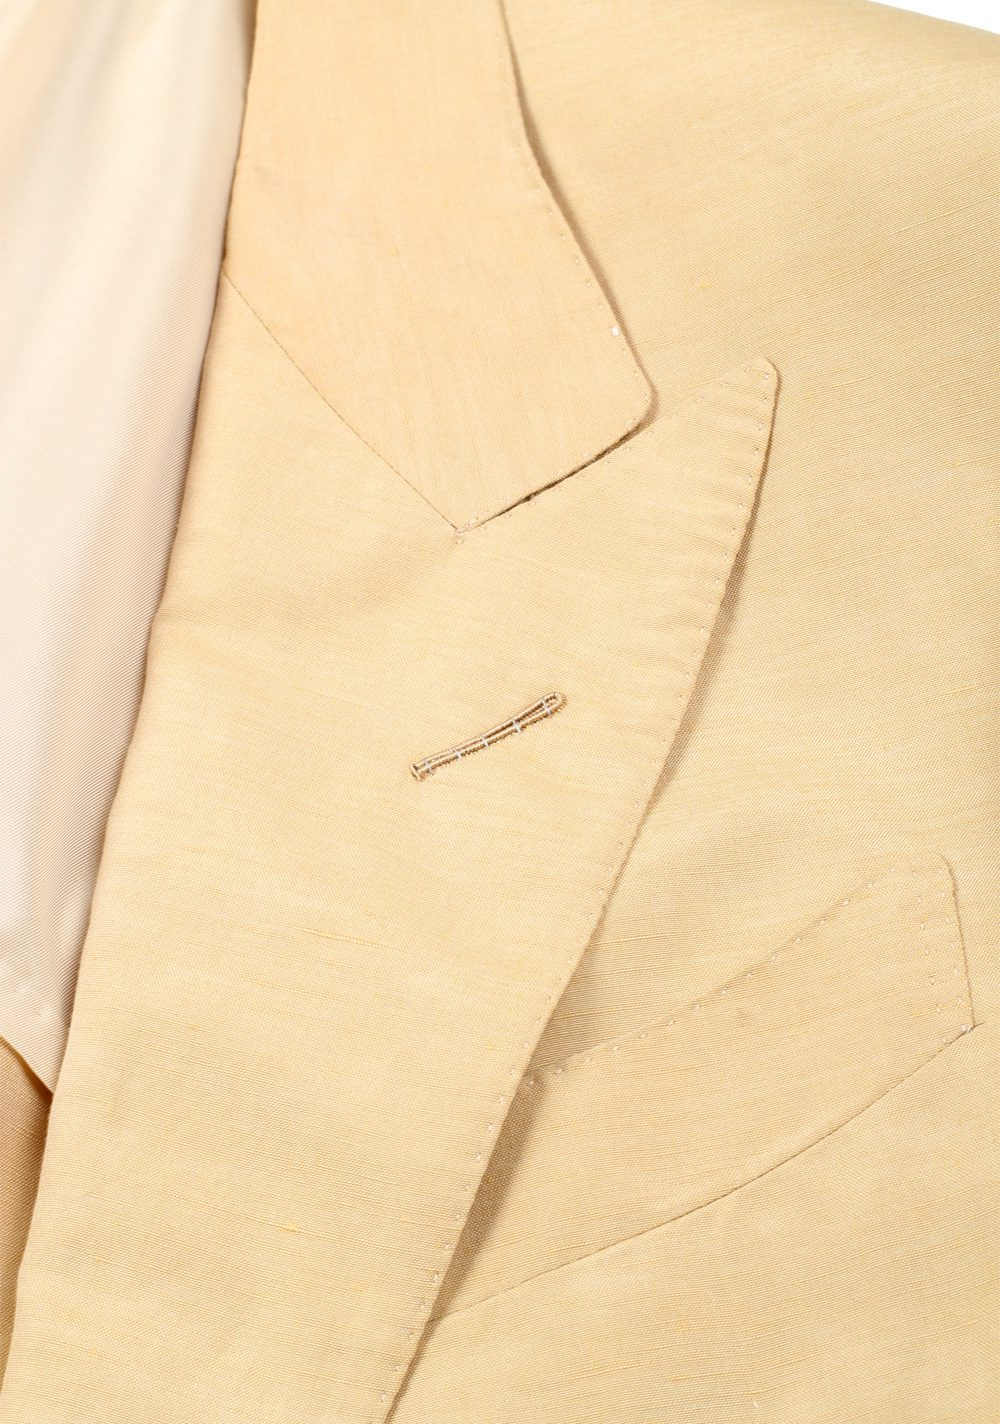 TOM FORD Shelton Beige Suit Size 48 / 38R U.S. In Linen Silk | Costume Limité